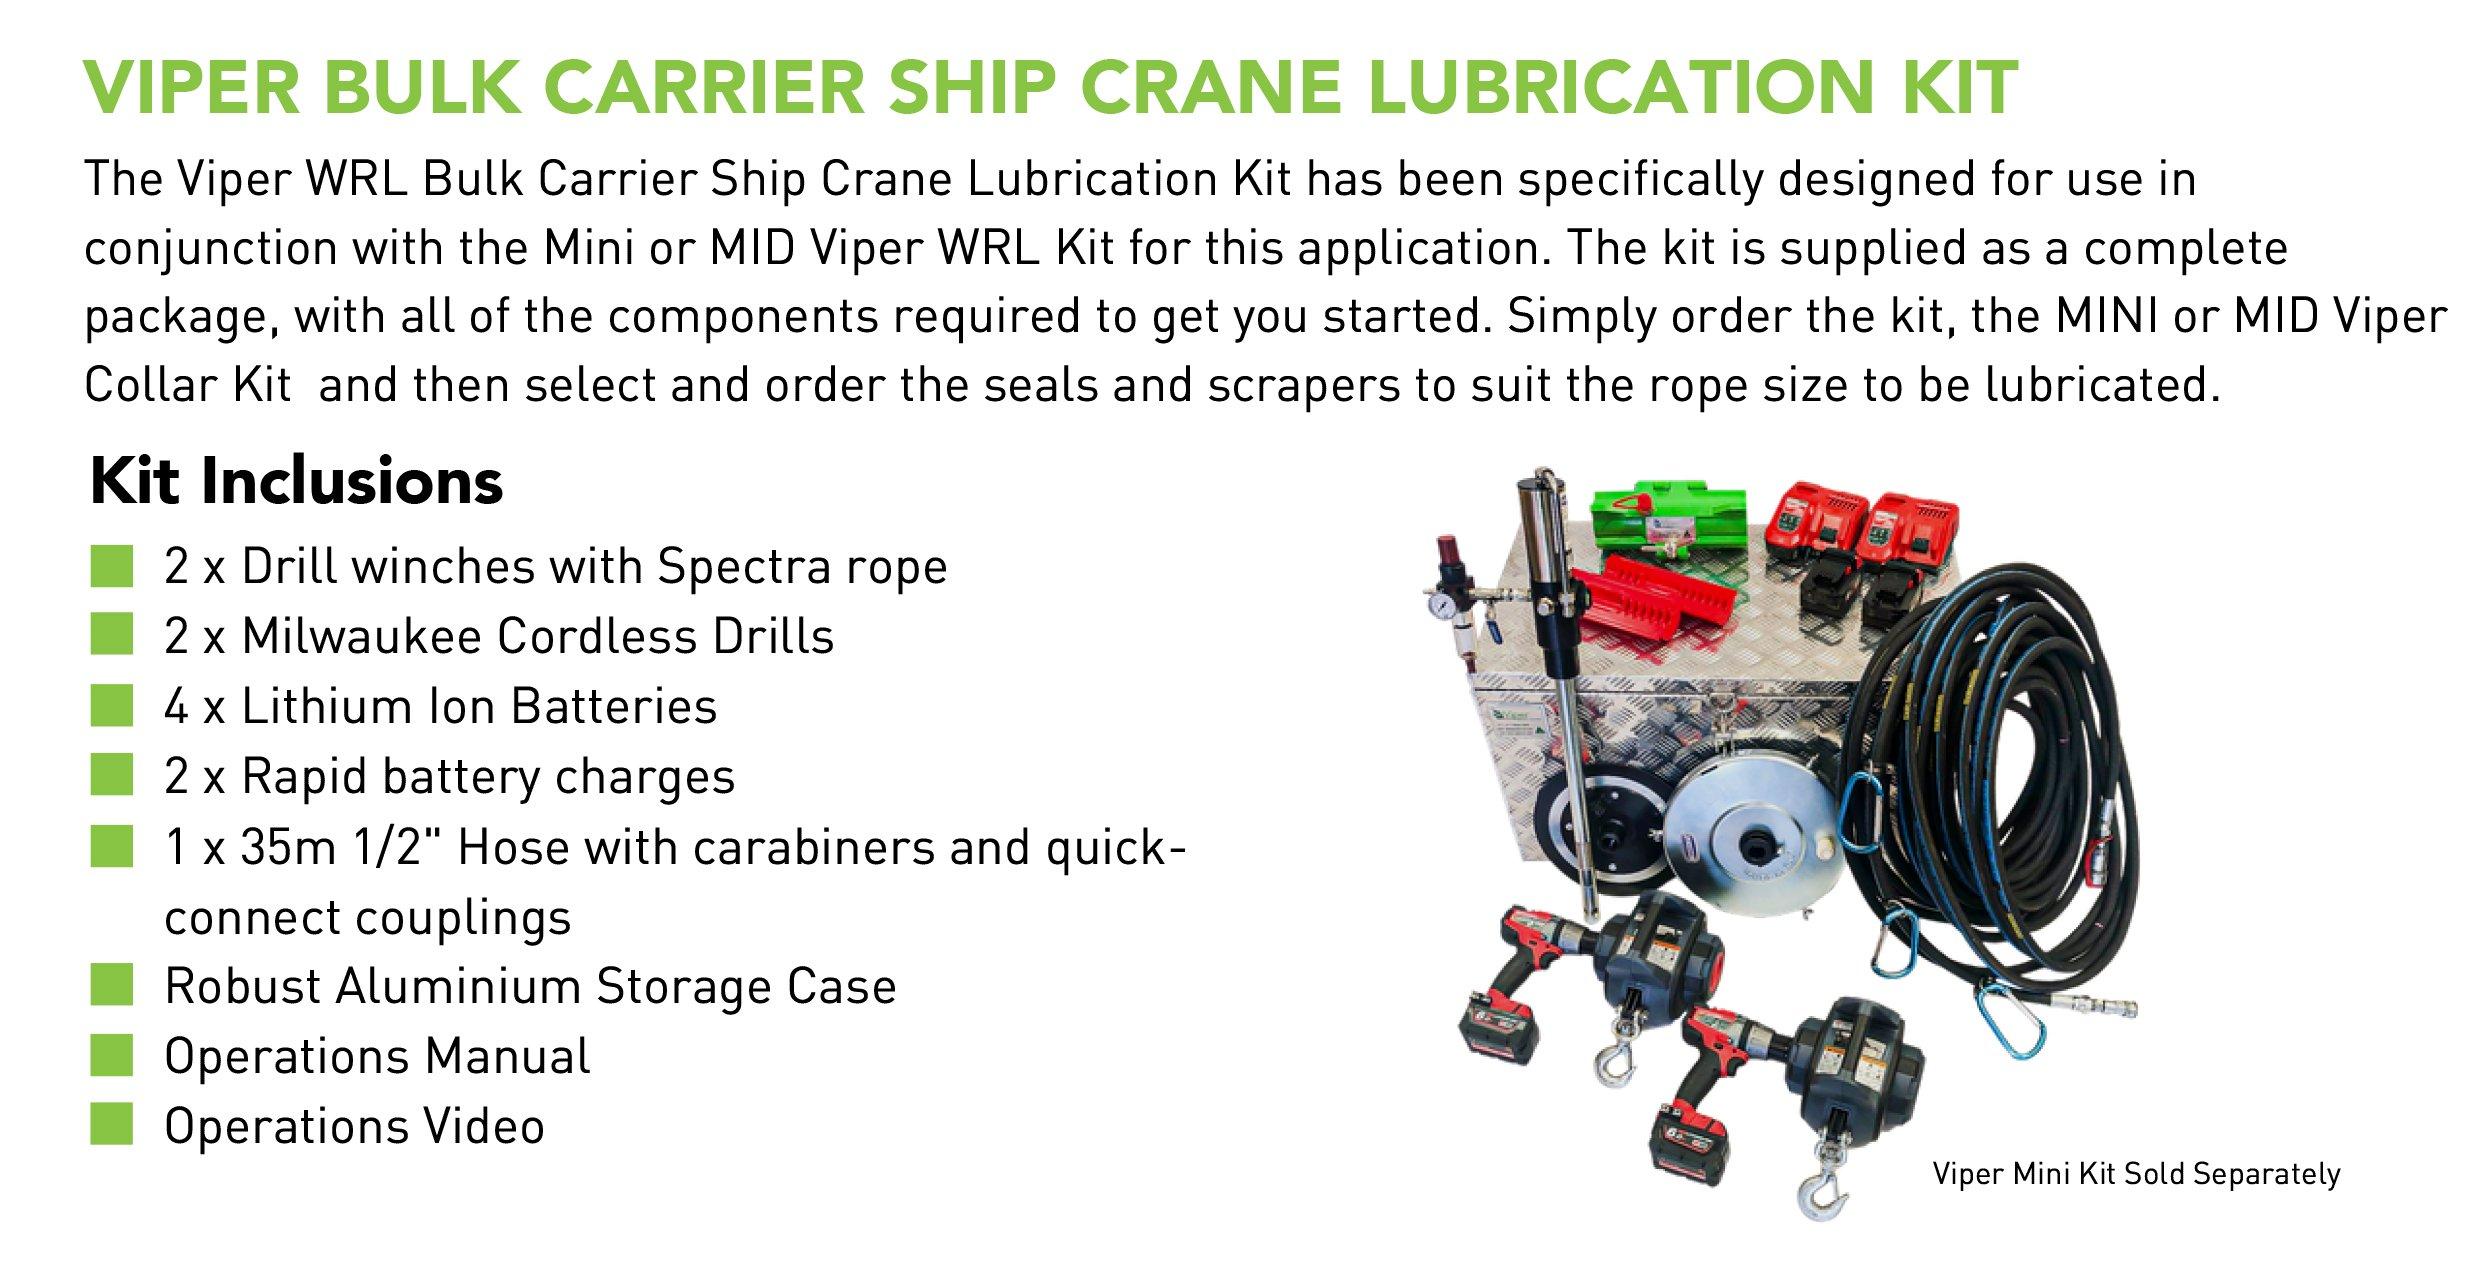 Viper Bulk Carrier Application